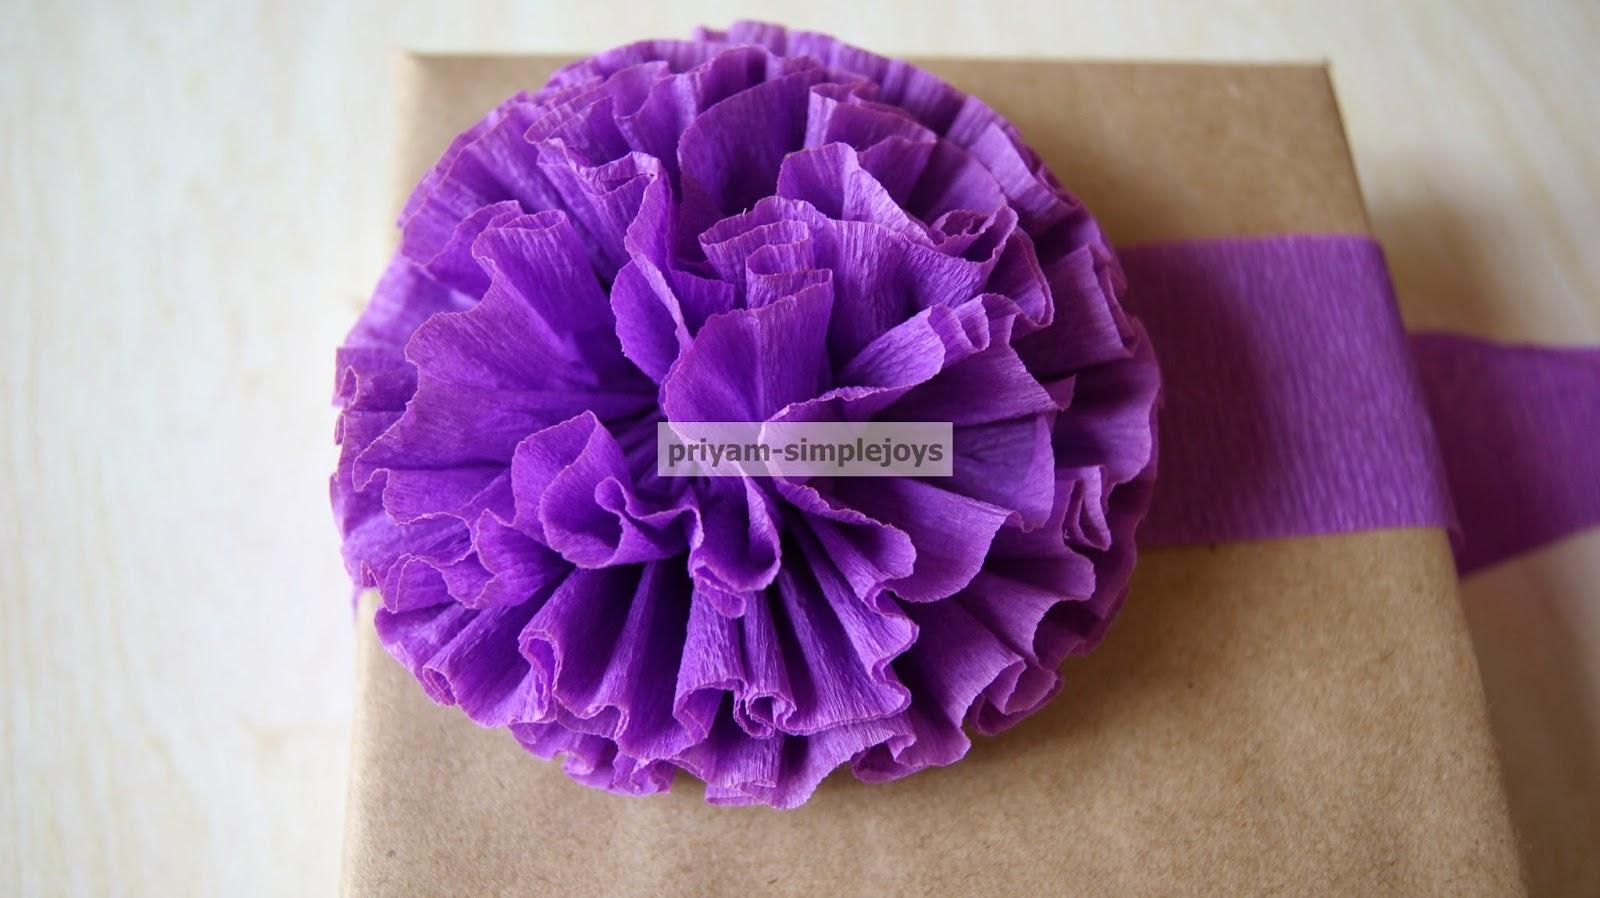 SimpleJoys Crepe Paper Flowers